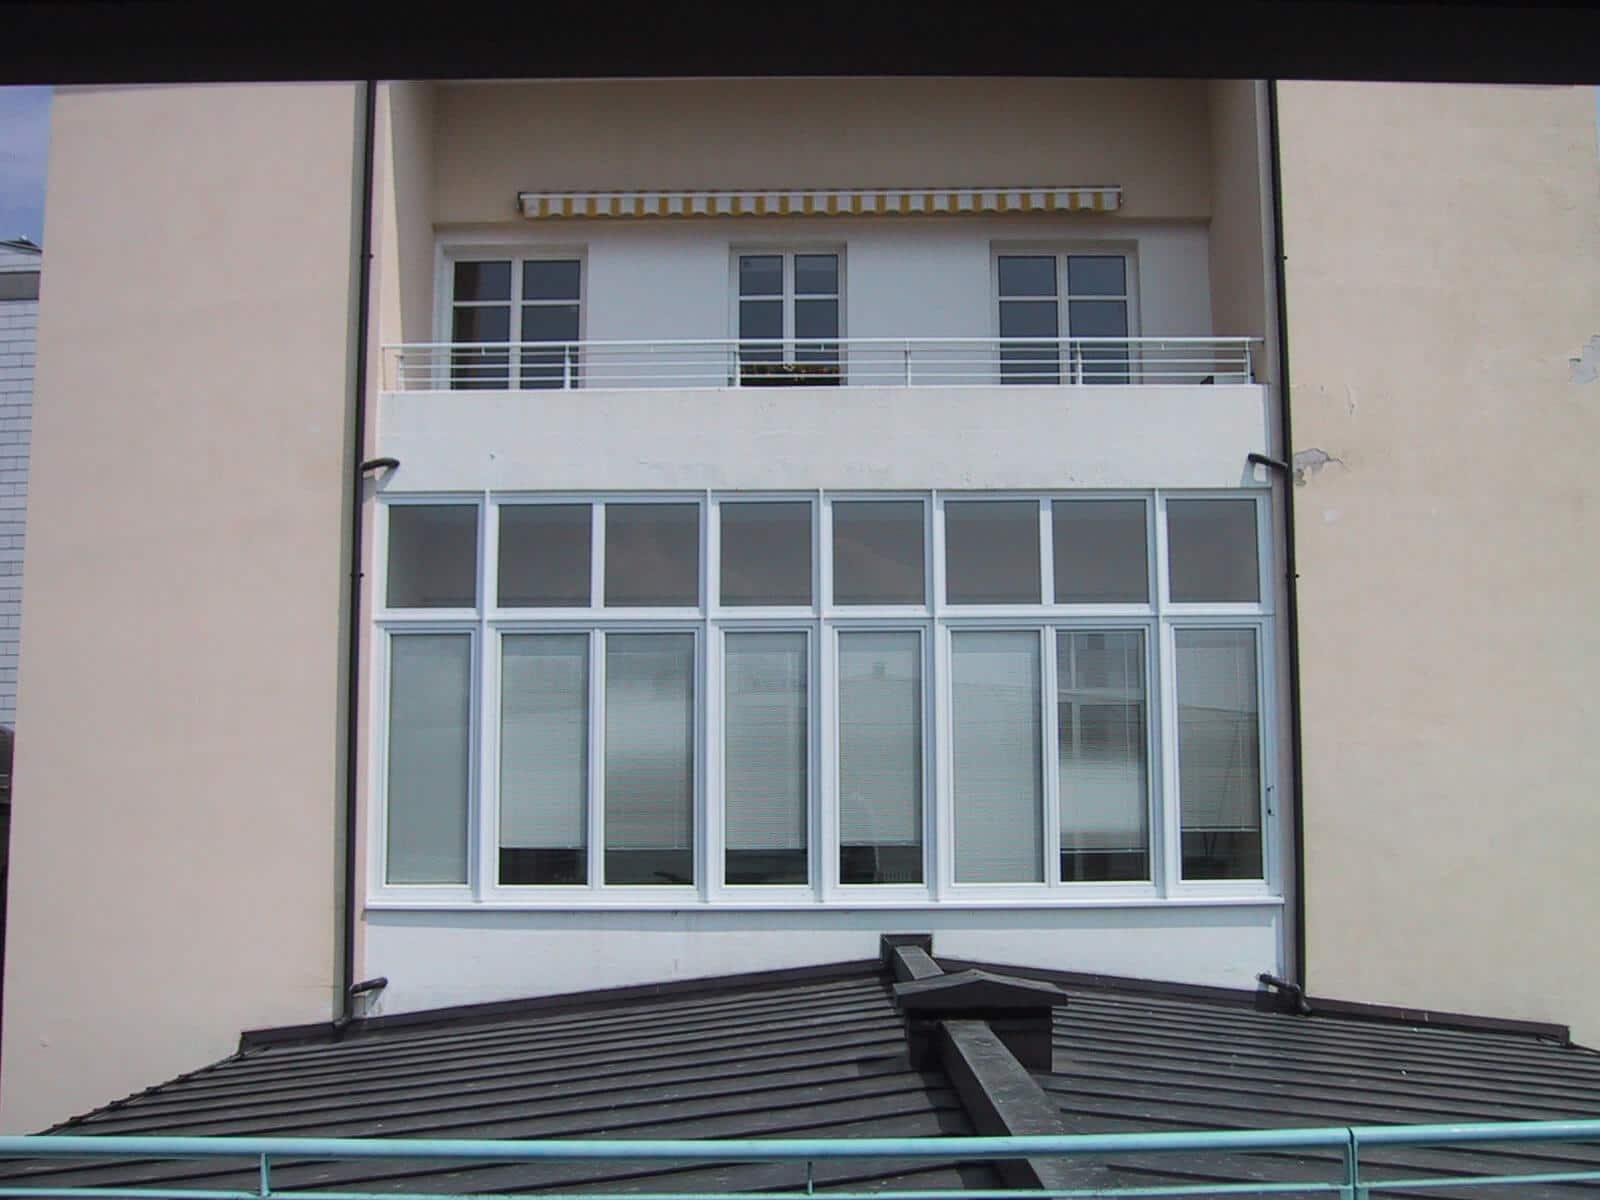 Balkonverbau mit Dreh-Kipp Fenster